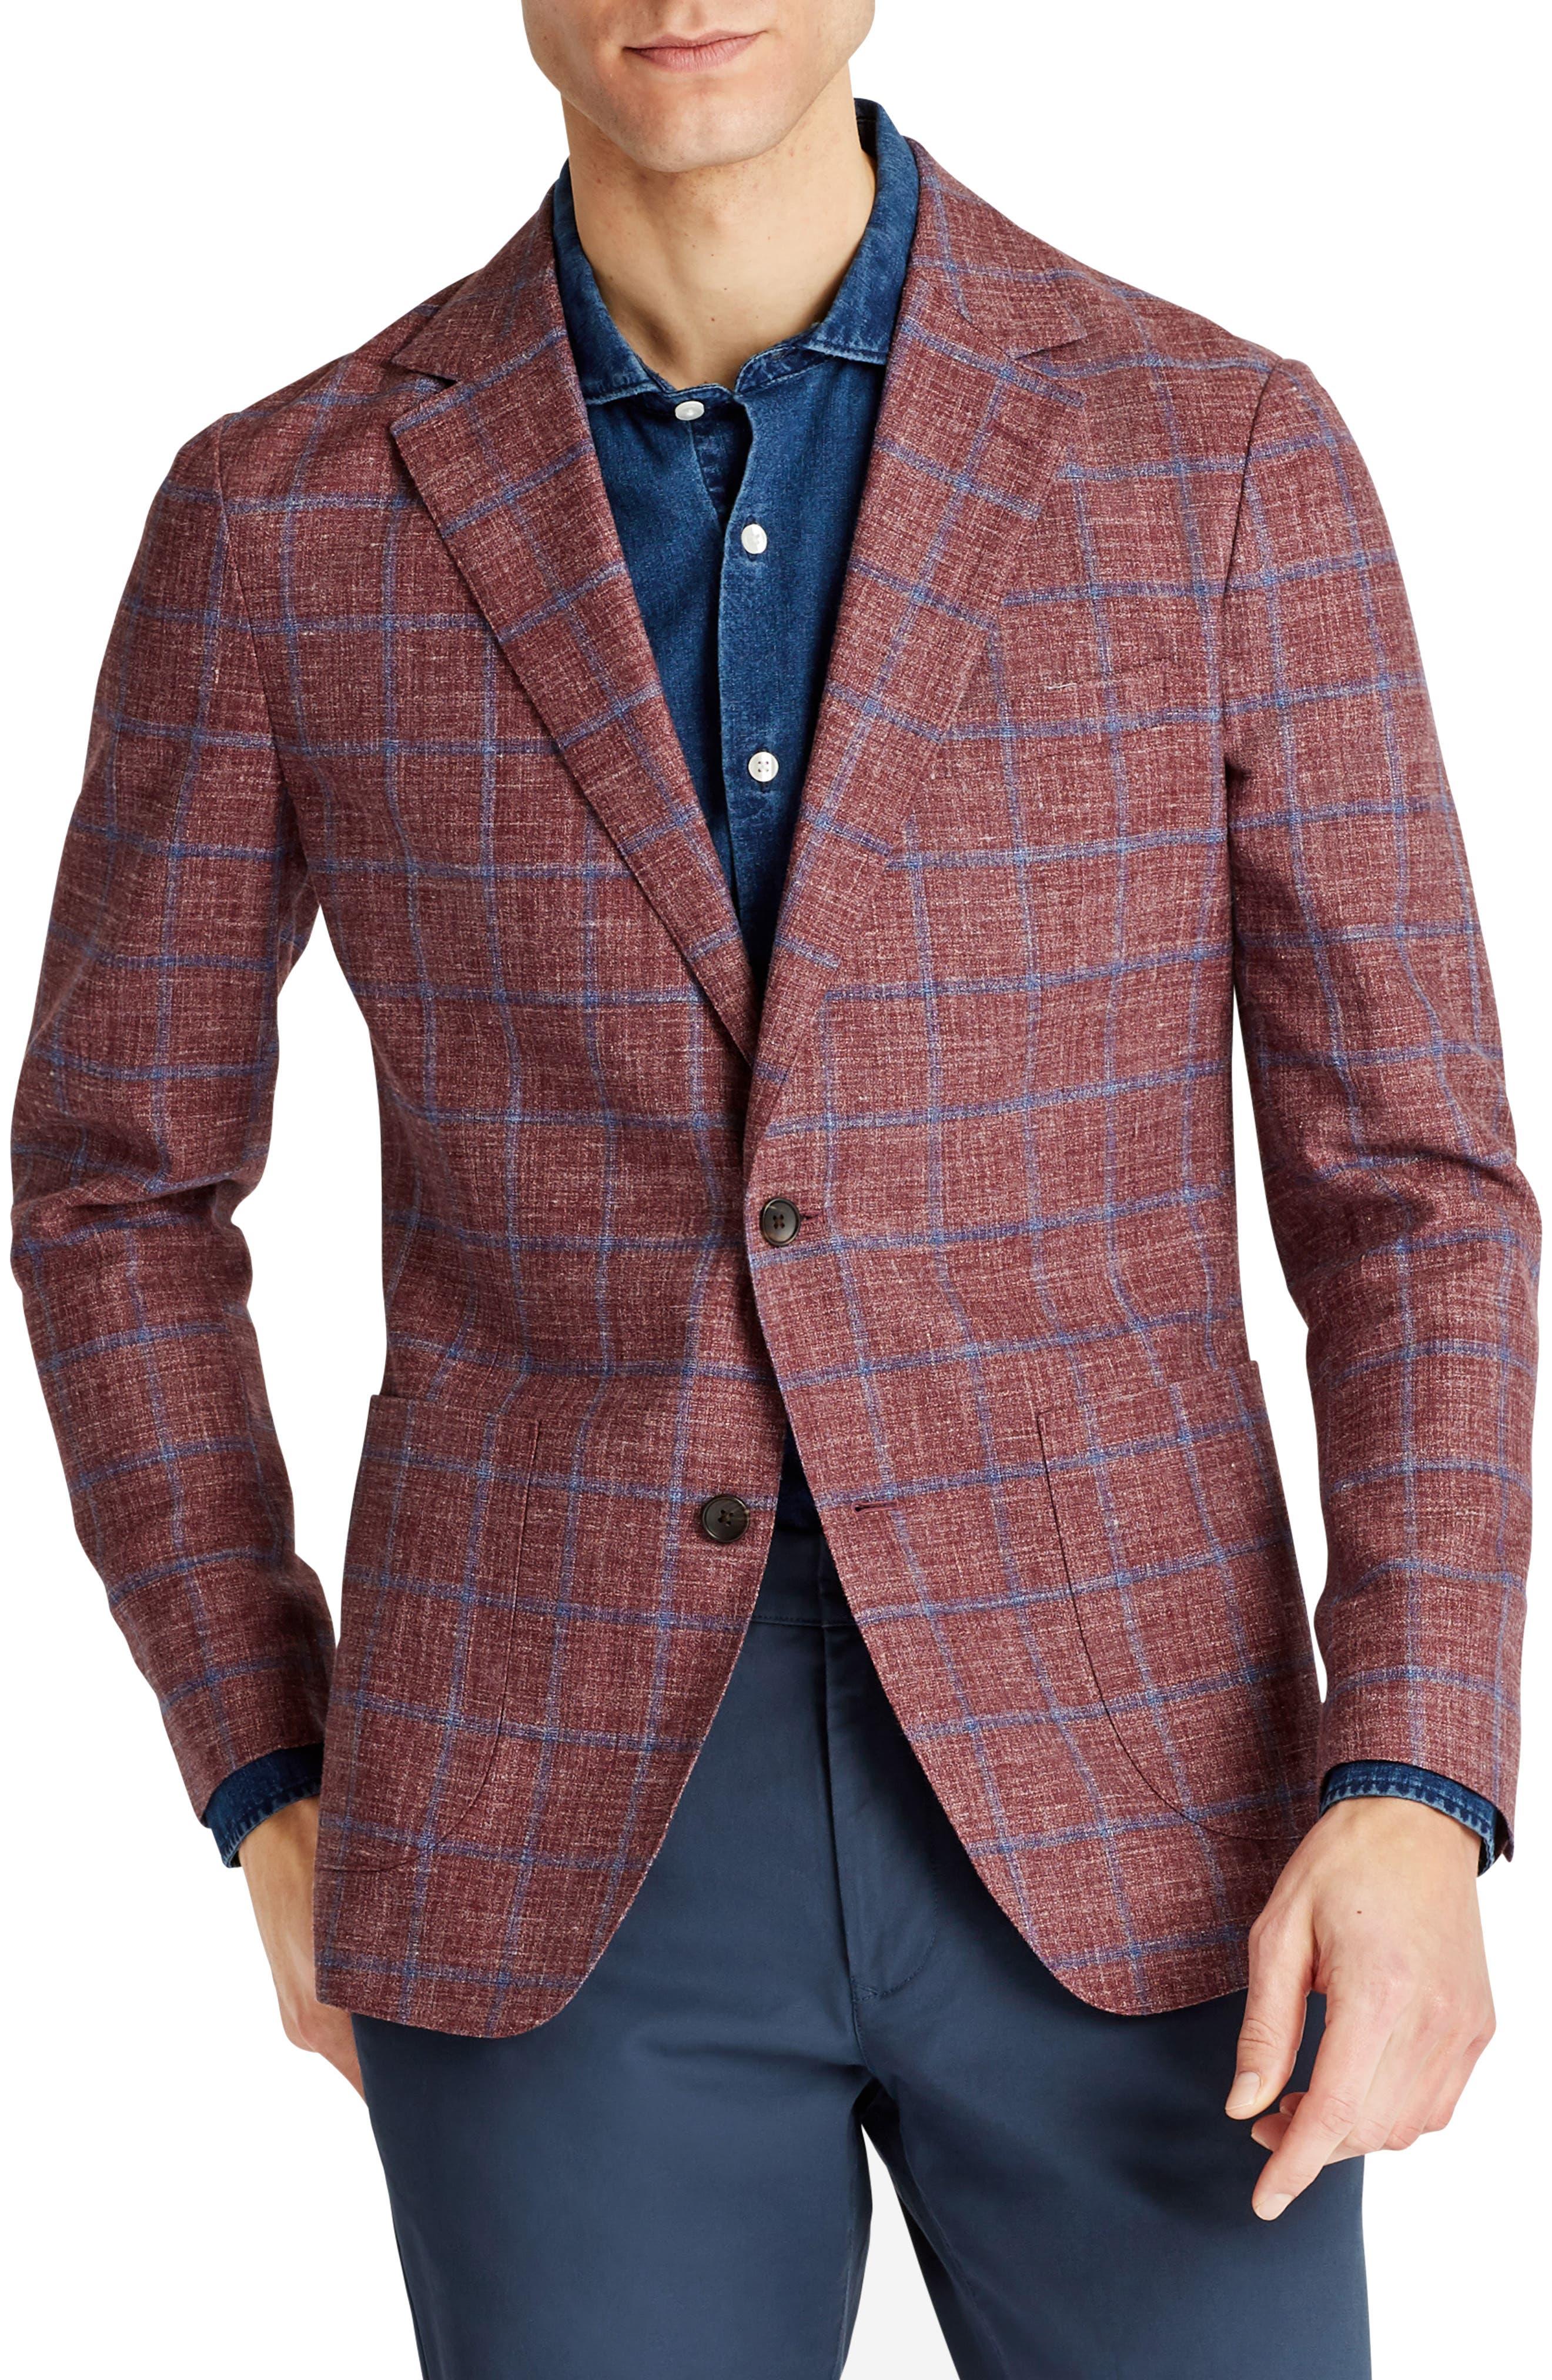 Capstone Slim Fit Windowpane Wool Blend Sport Coat,                             Main thumbnail 1, color,                             600